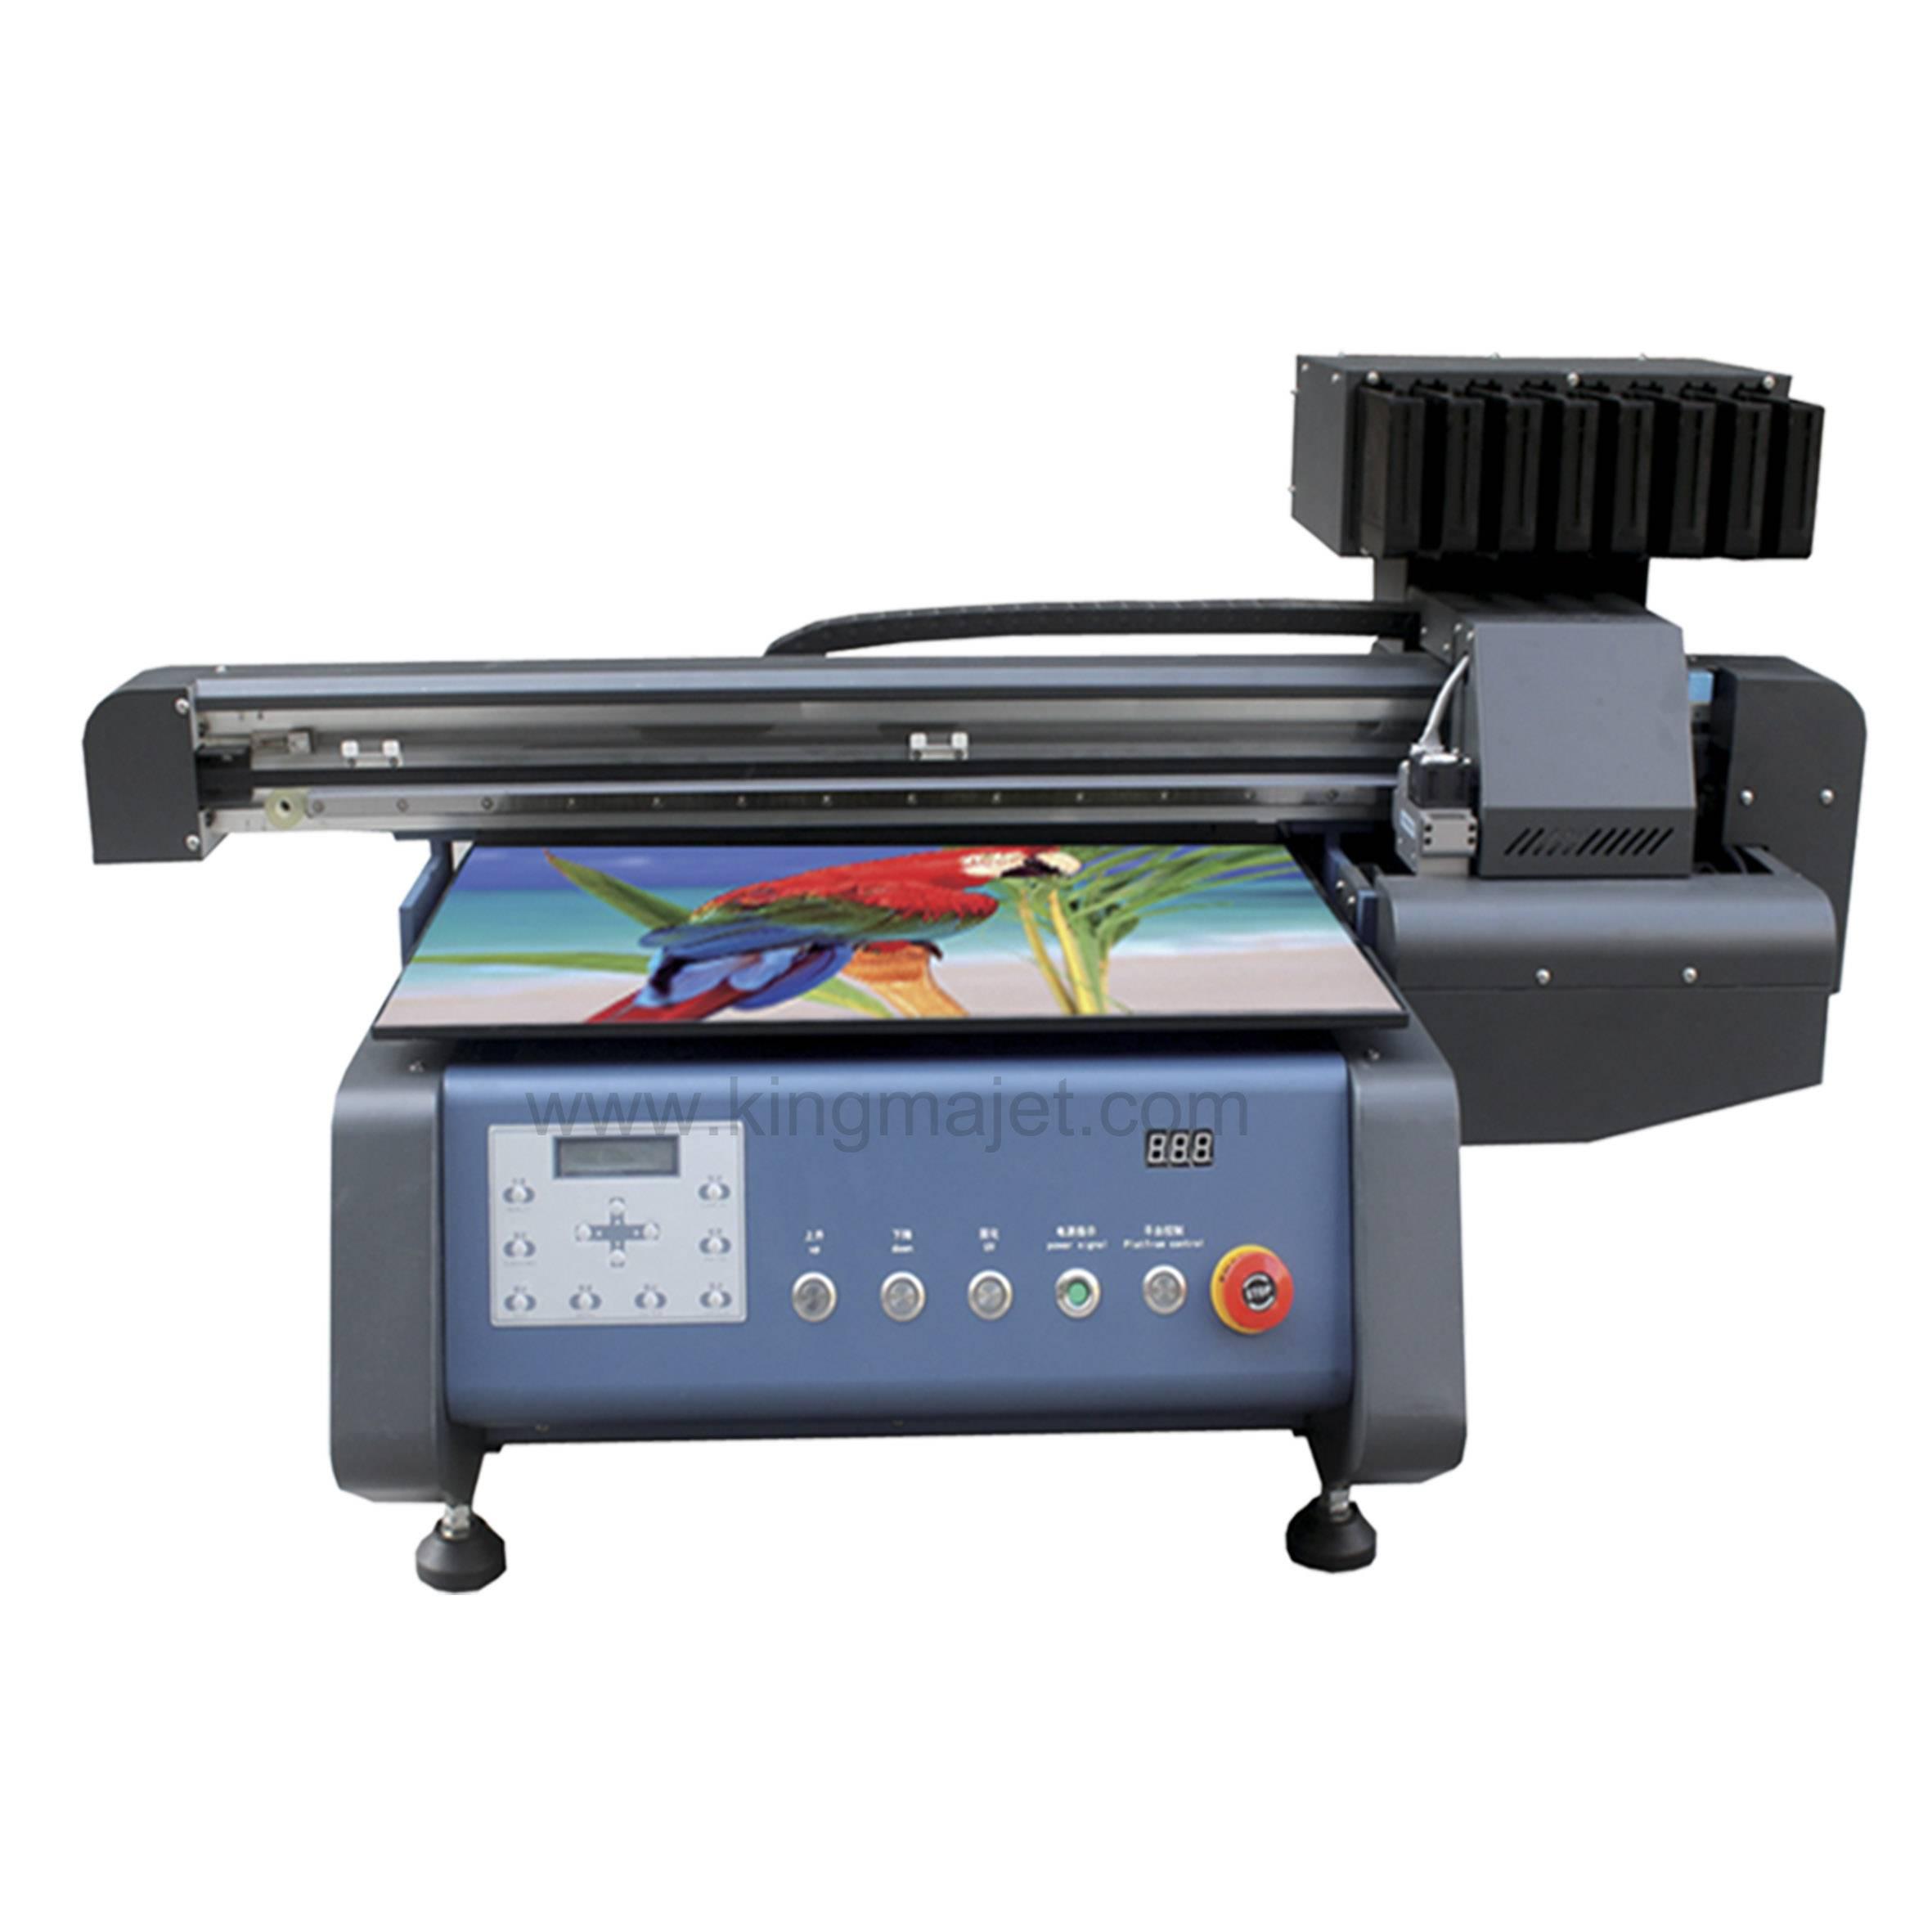 Weihang MJ-UV0604 UV Digital Printing Machine